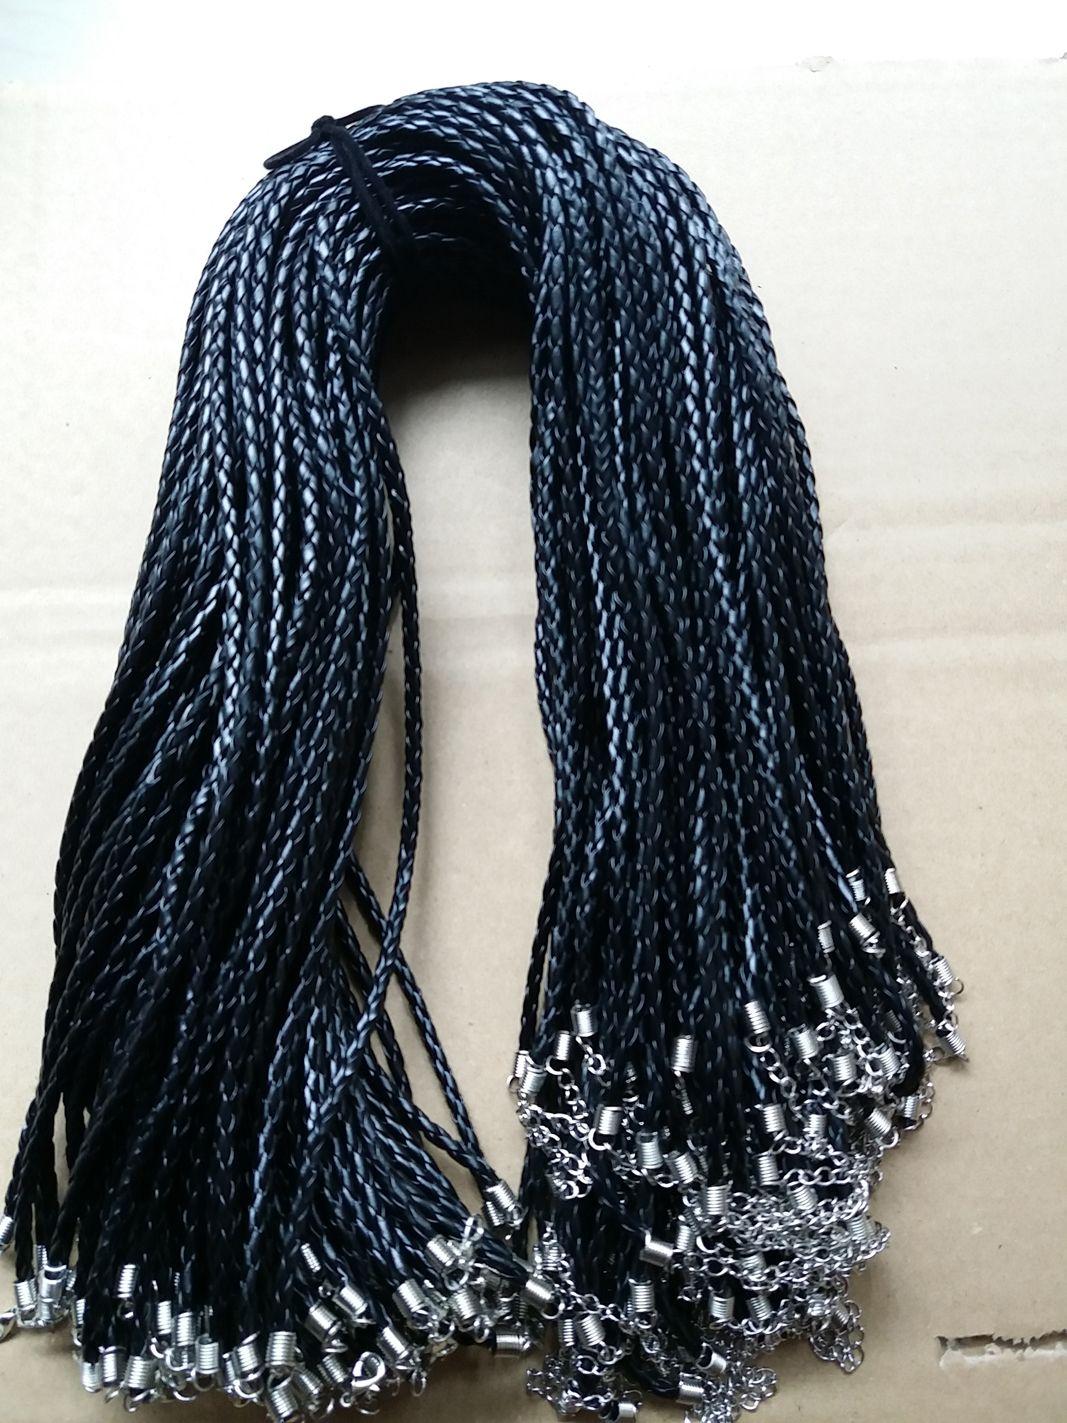 DIY 공예 펜던트 목걸이의 보석 3mm 블랙 PU 가죽 끈 로프 보석 로프 랍스터 걸쇠 코드 20 ''22 ''24 ''